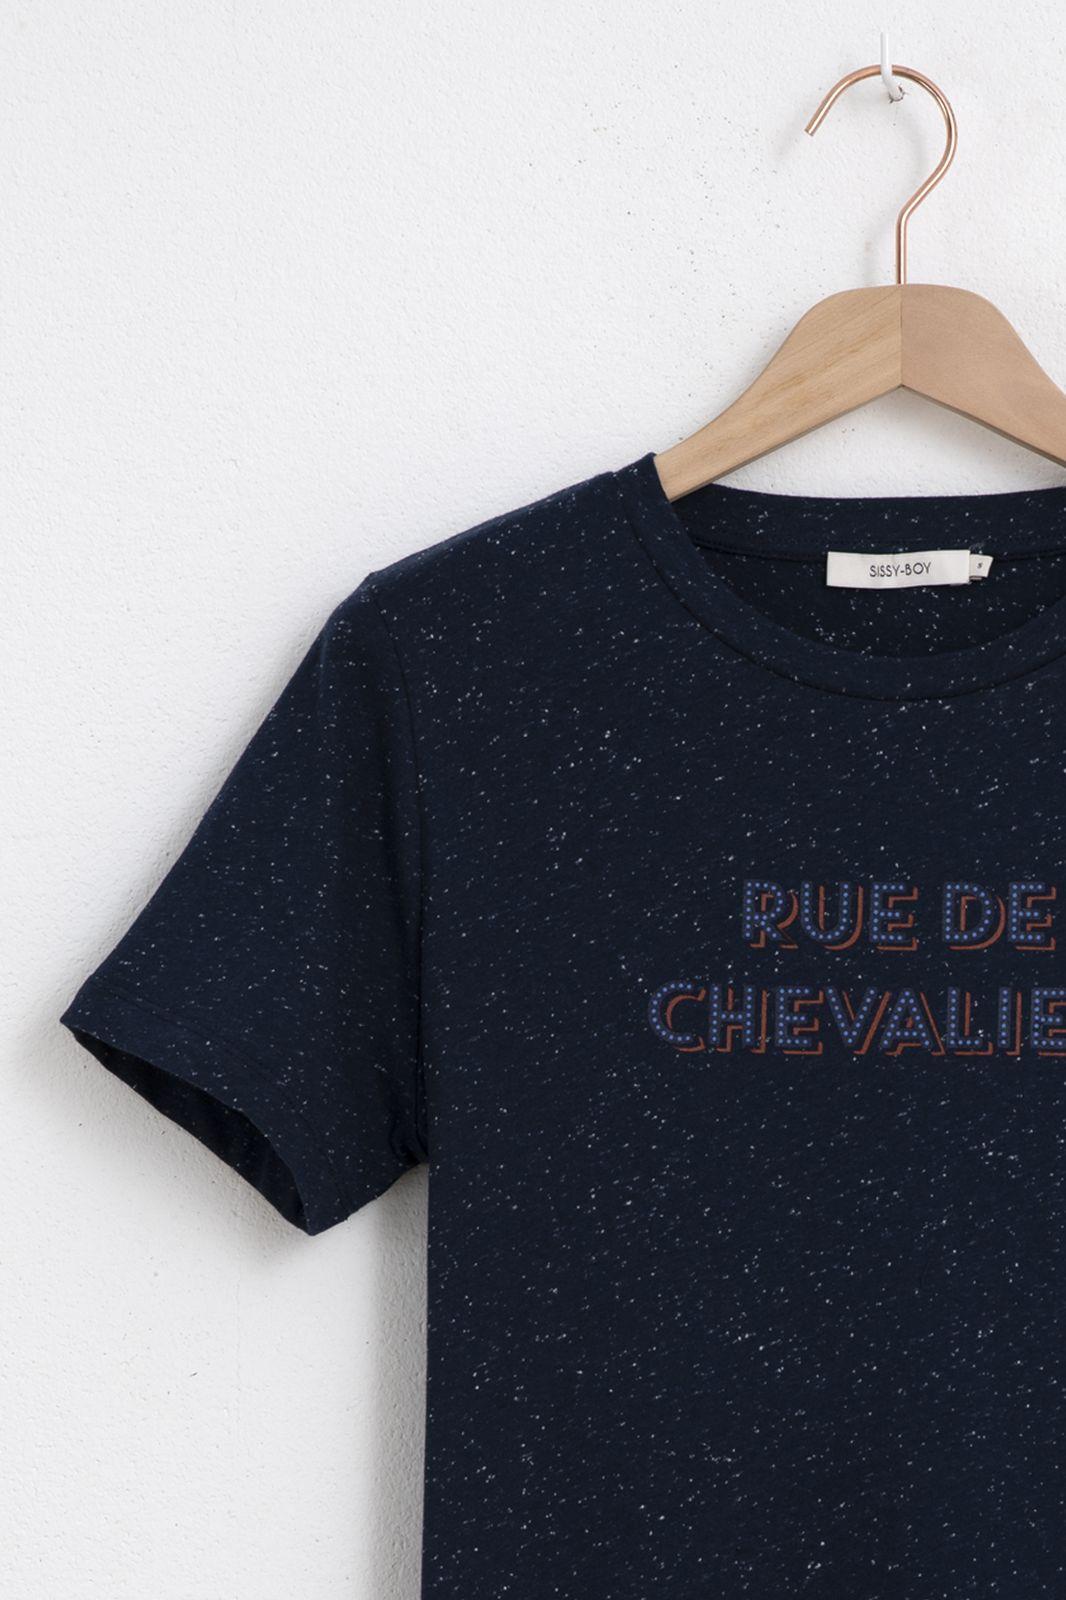 Donkerblauw t-shirt met tekst